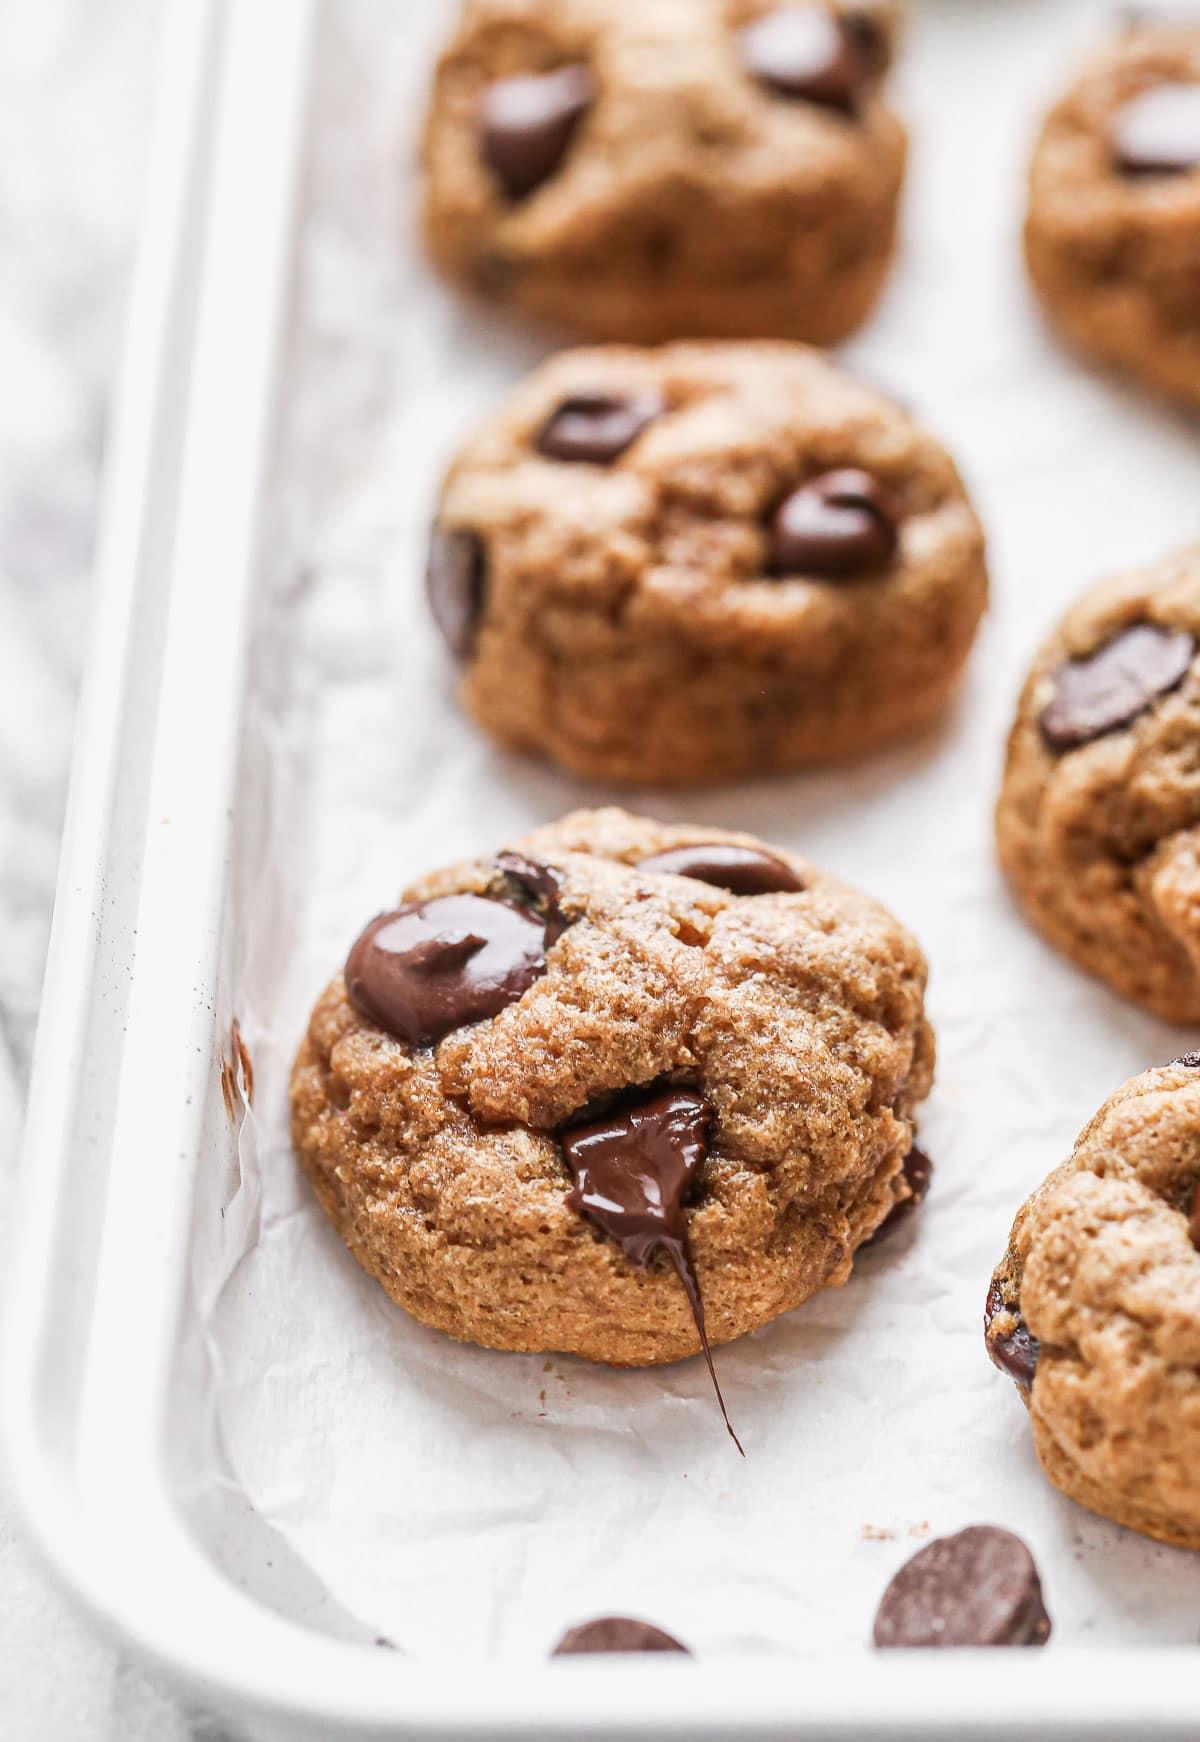 Gooey whole wheat chocolate chip cookies